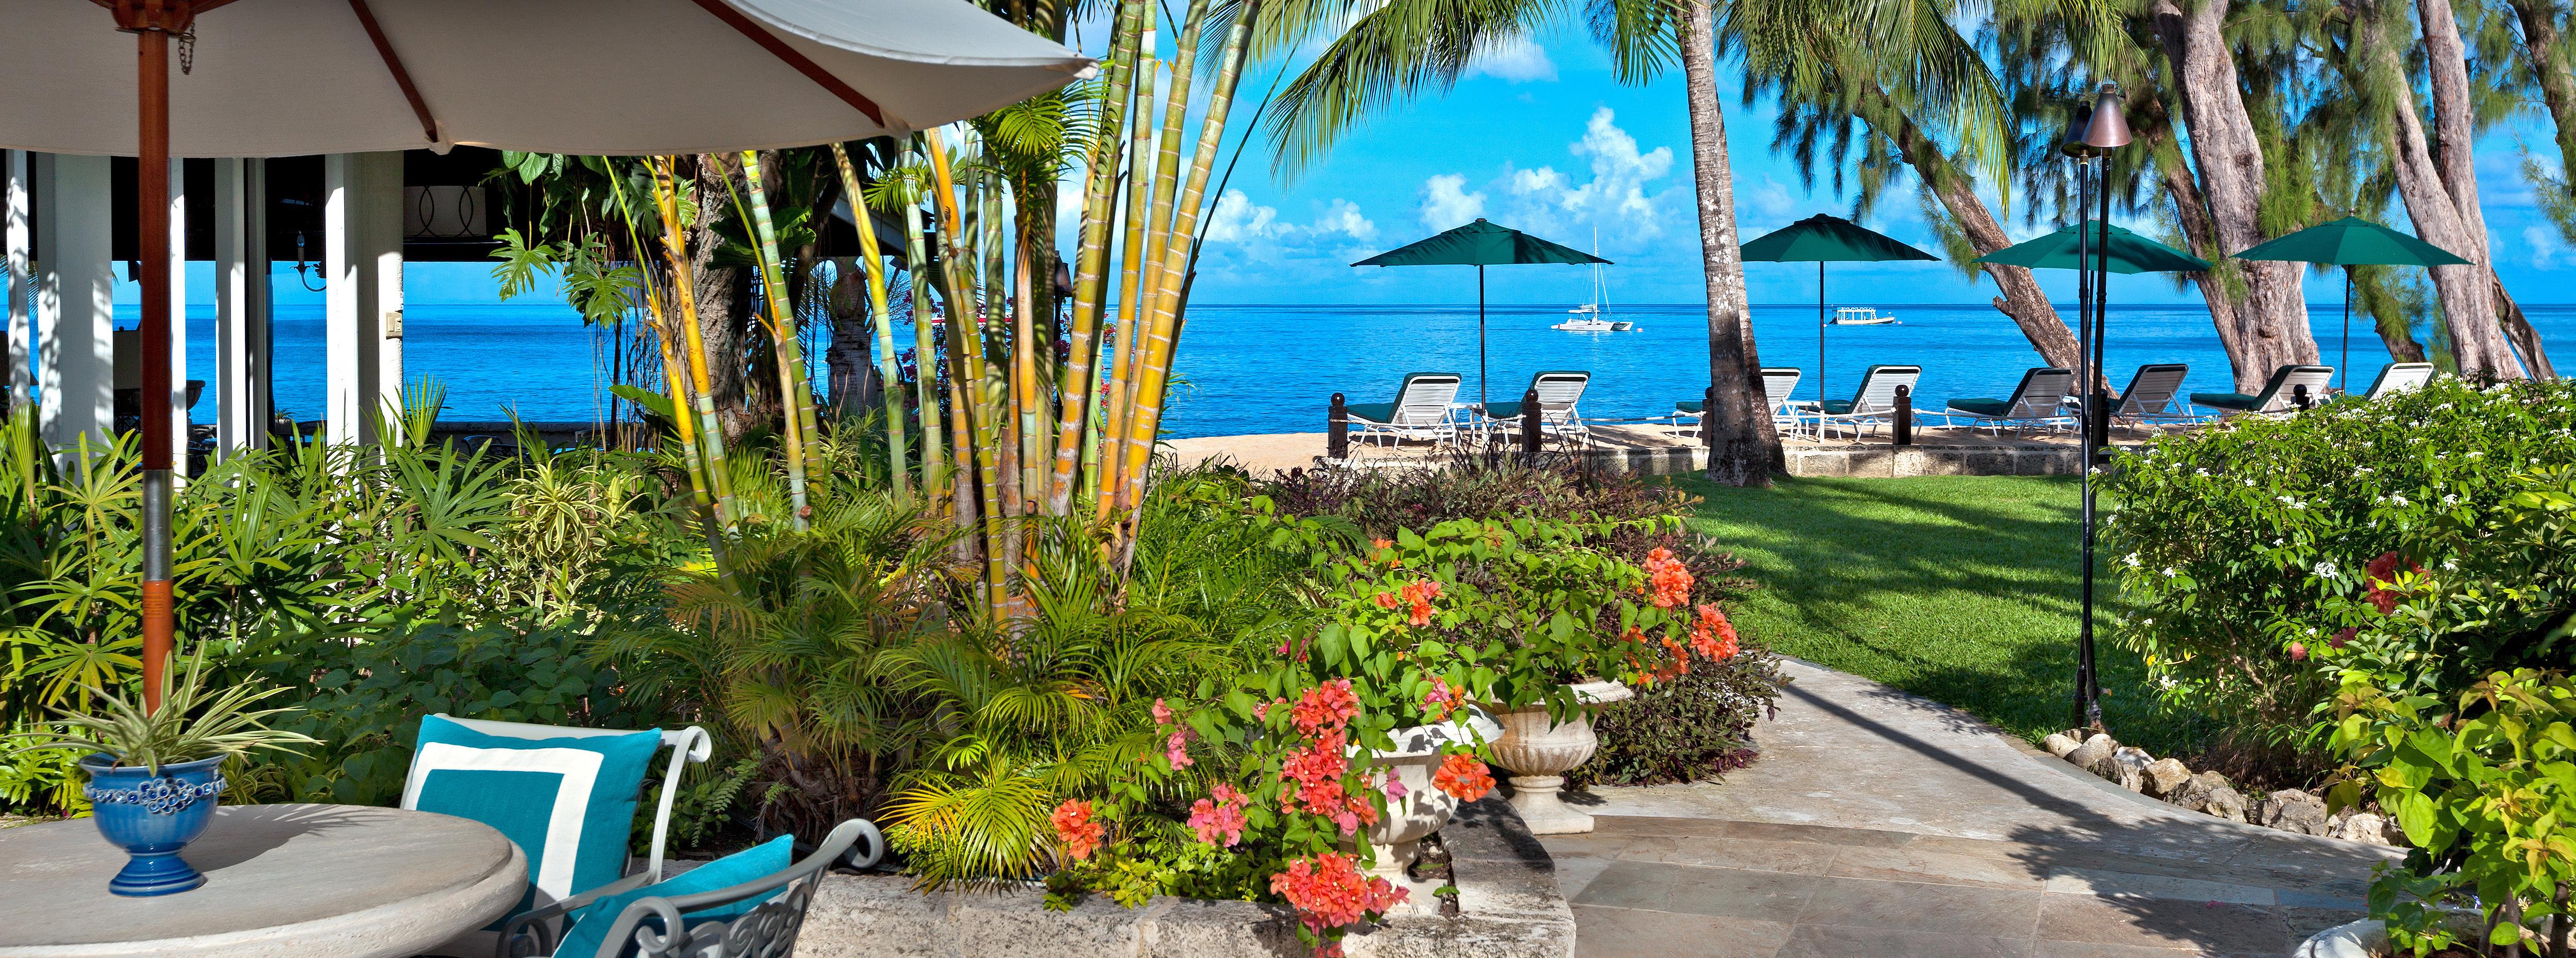 walkway-to-beach-coral-reef-club